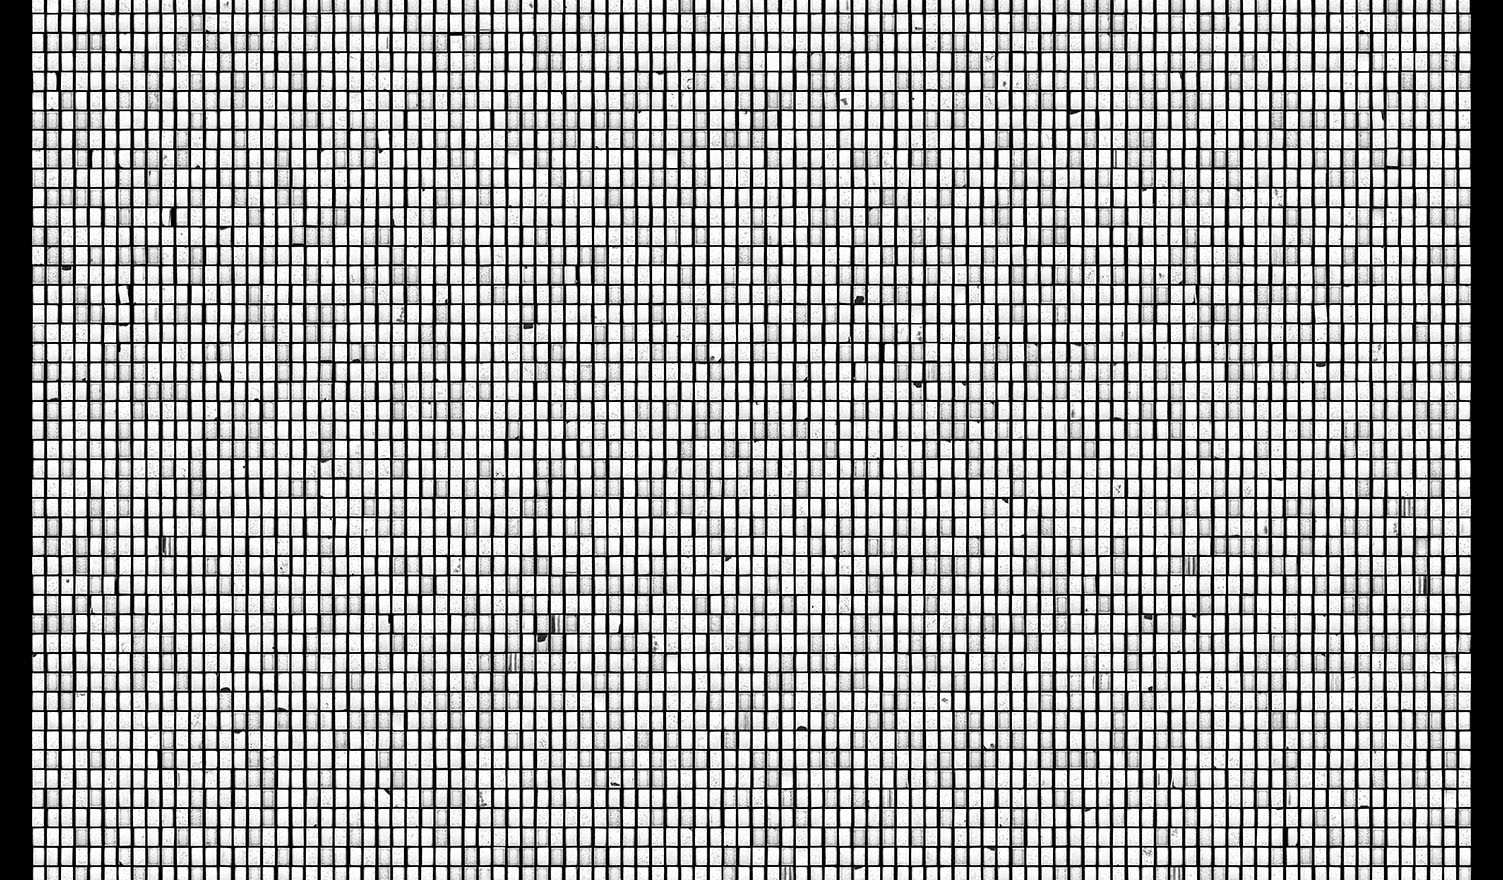 Society 015 193x145cm 145x110cm Pigment Inkjet  2017